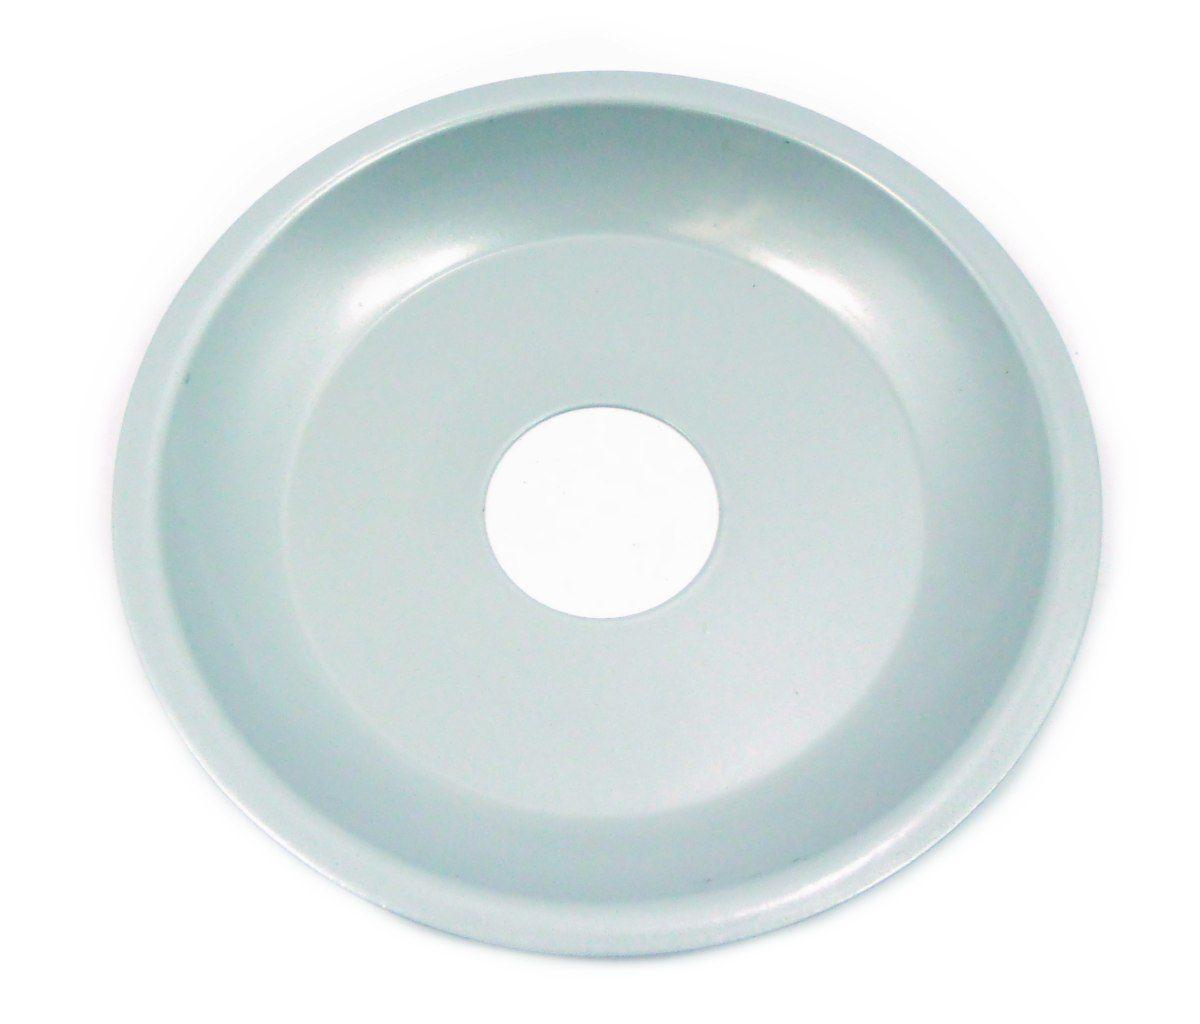 Prato para Narguile 15cm de diâmetro, pintado, 4cm de diâmetro furo. Cinza prateado